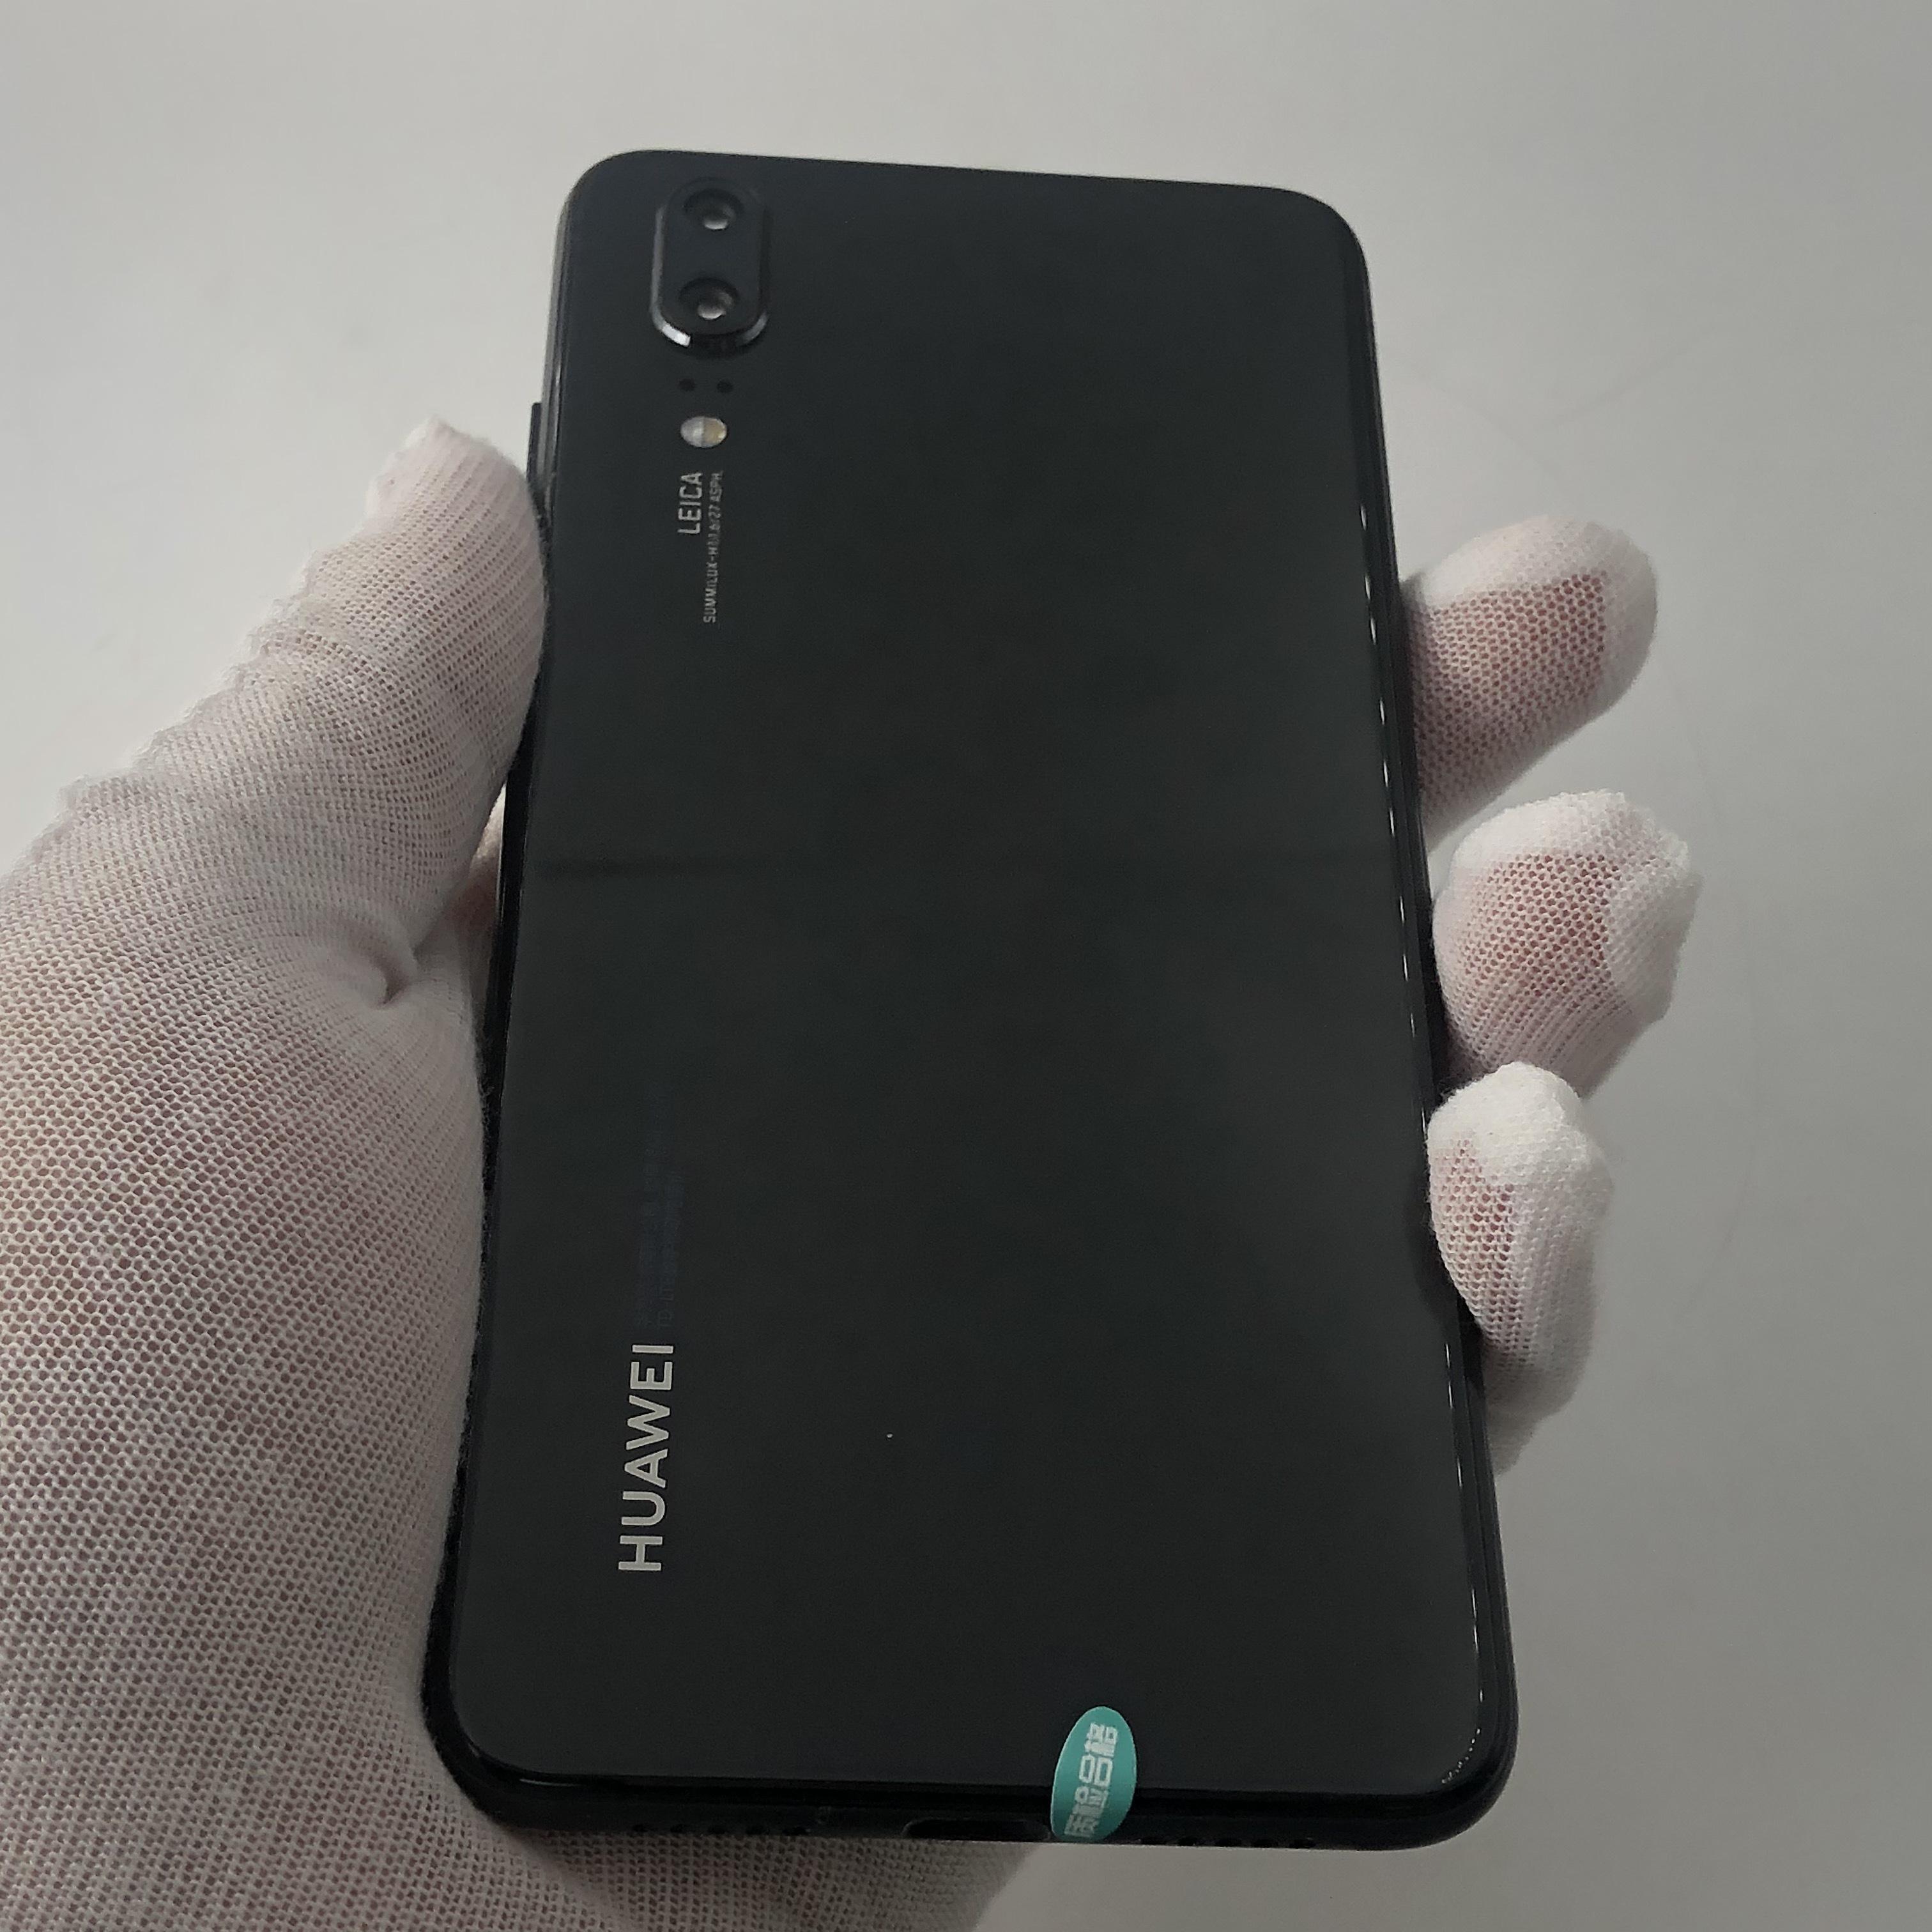 华为【P20】4G全网通 黑色 6G/64G 国行 95新